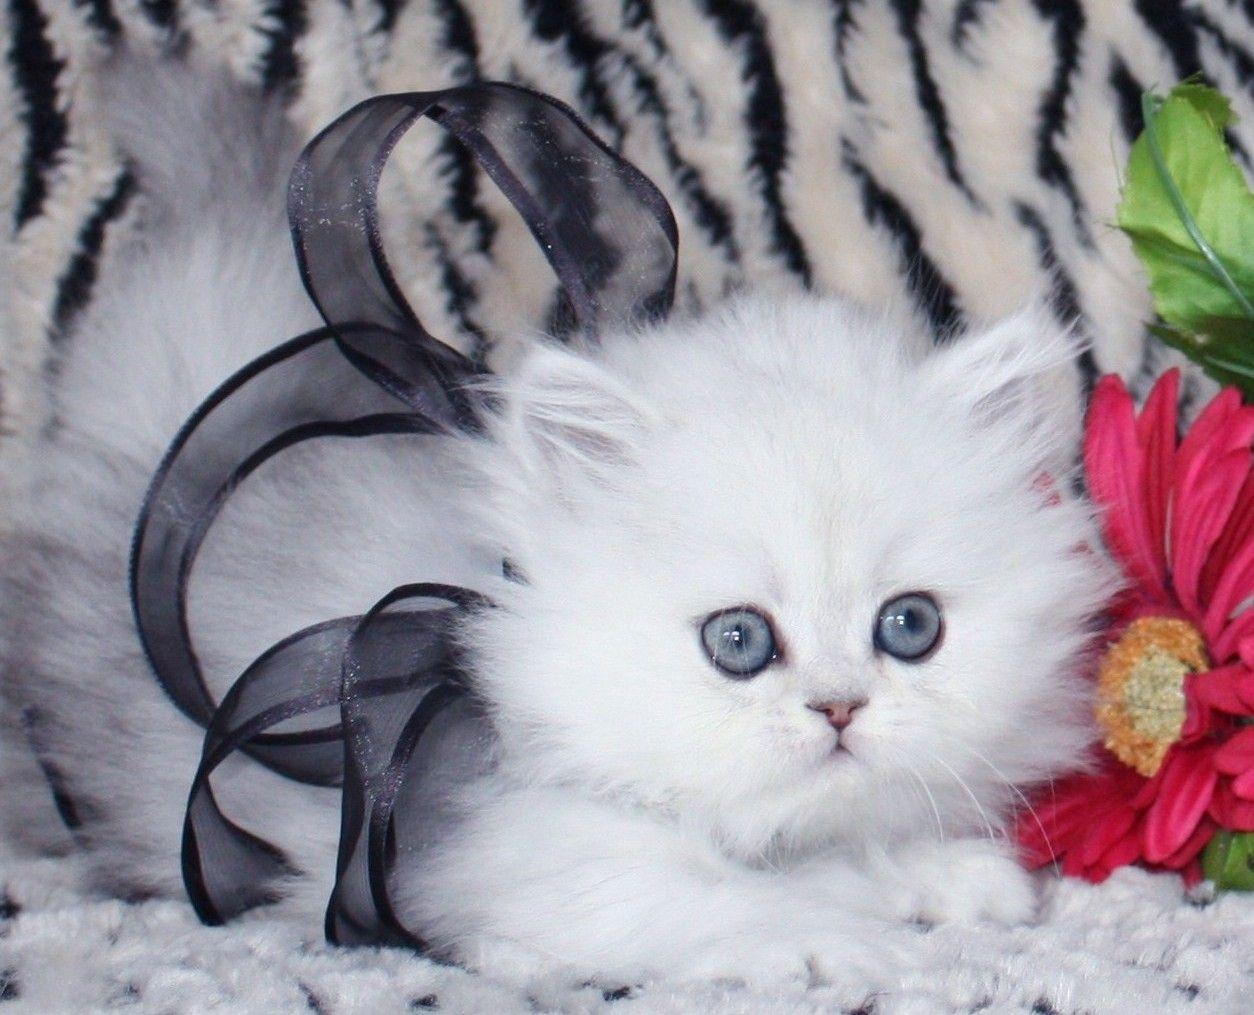 Teacup Persian Kitten Teacup Persian Kittens Persian Kittens Teacup Persian Cats